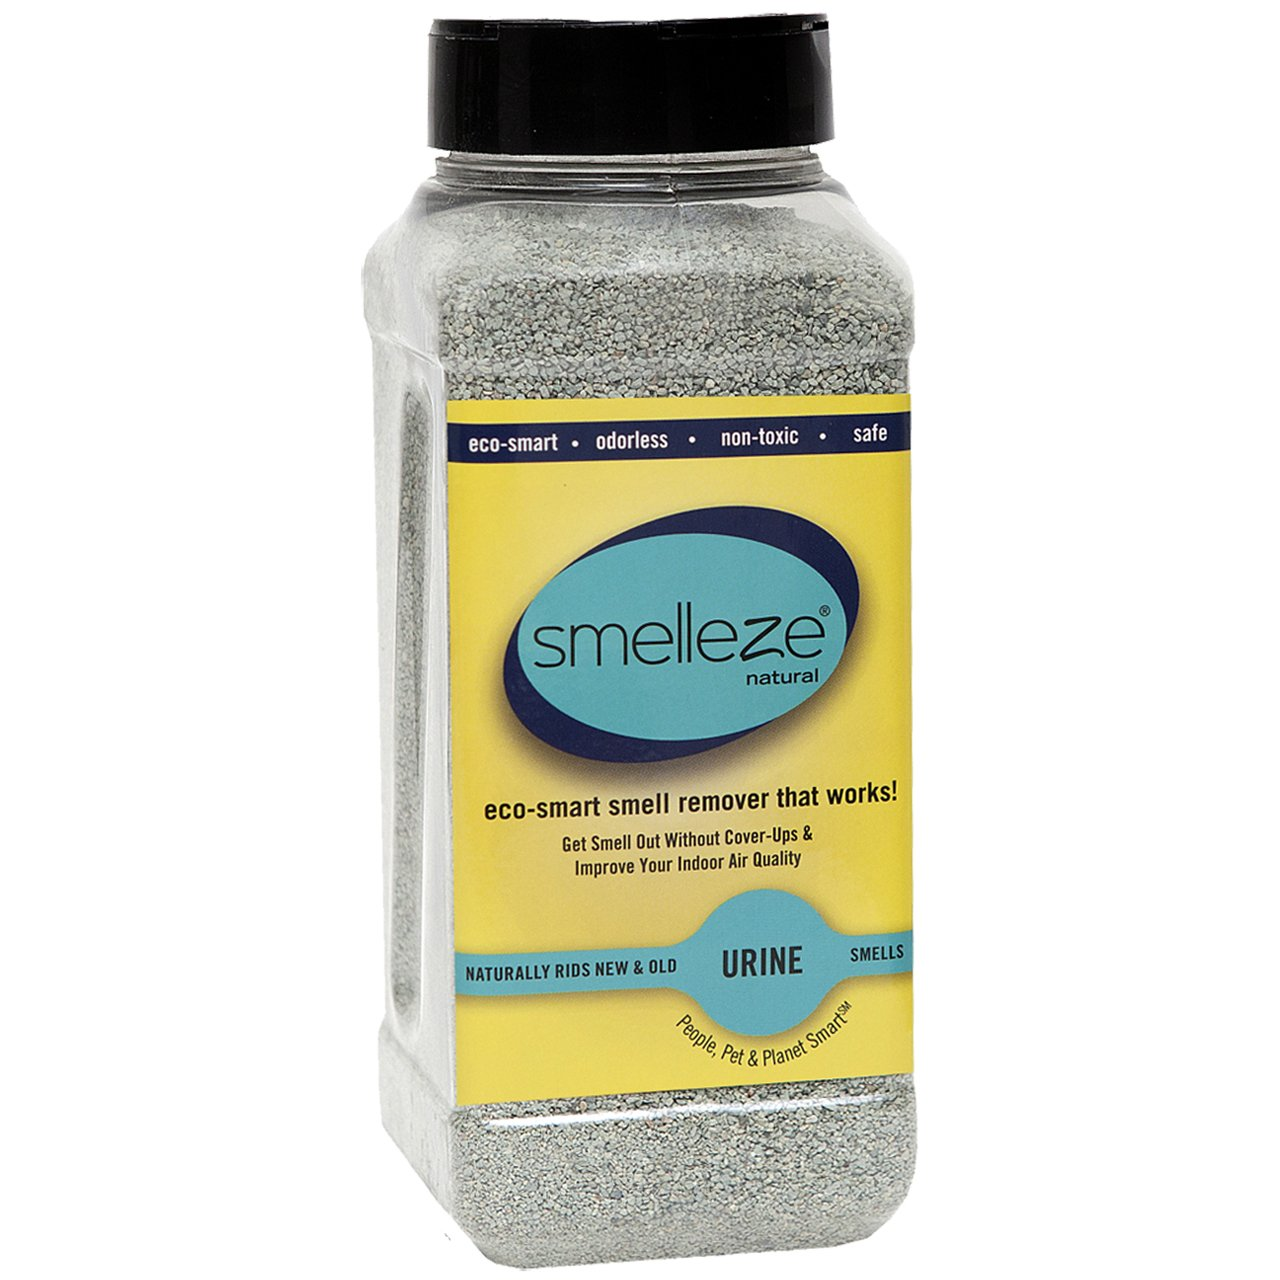 SMELLEZE Natural Urine Smell Eliminator Deodorizer: 50 lb. Powder Get Smell Out